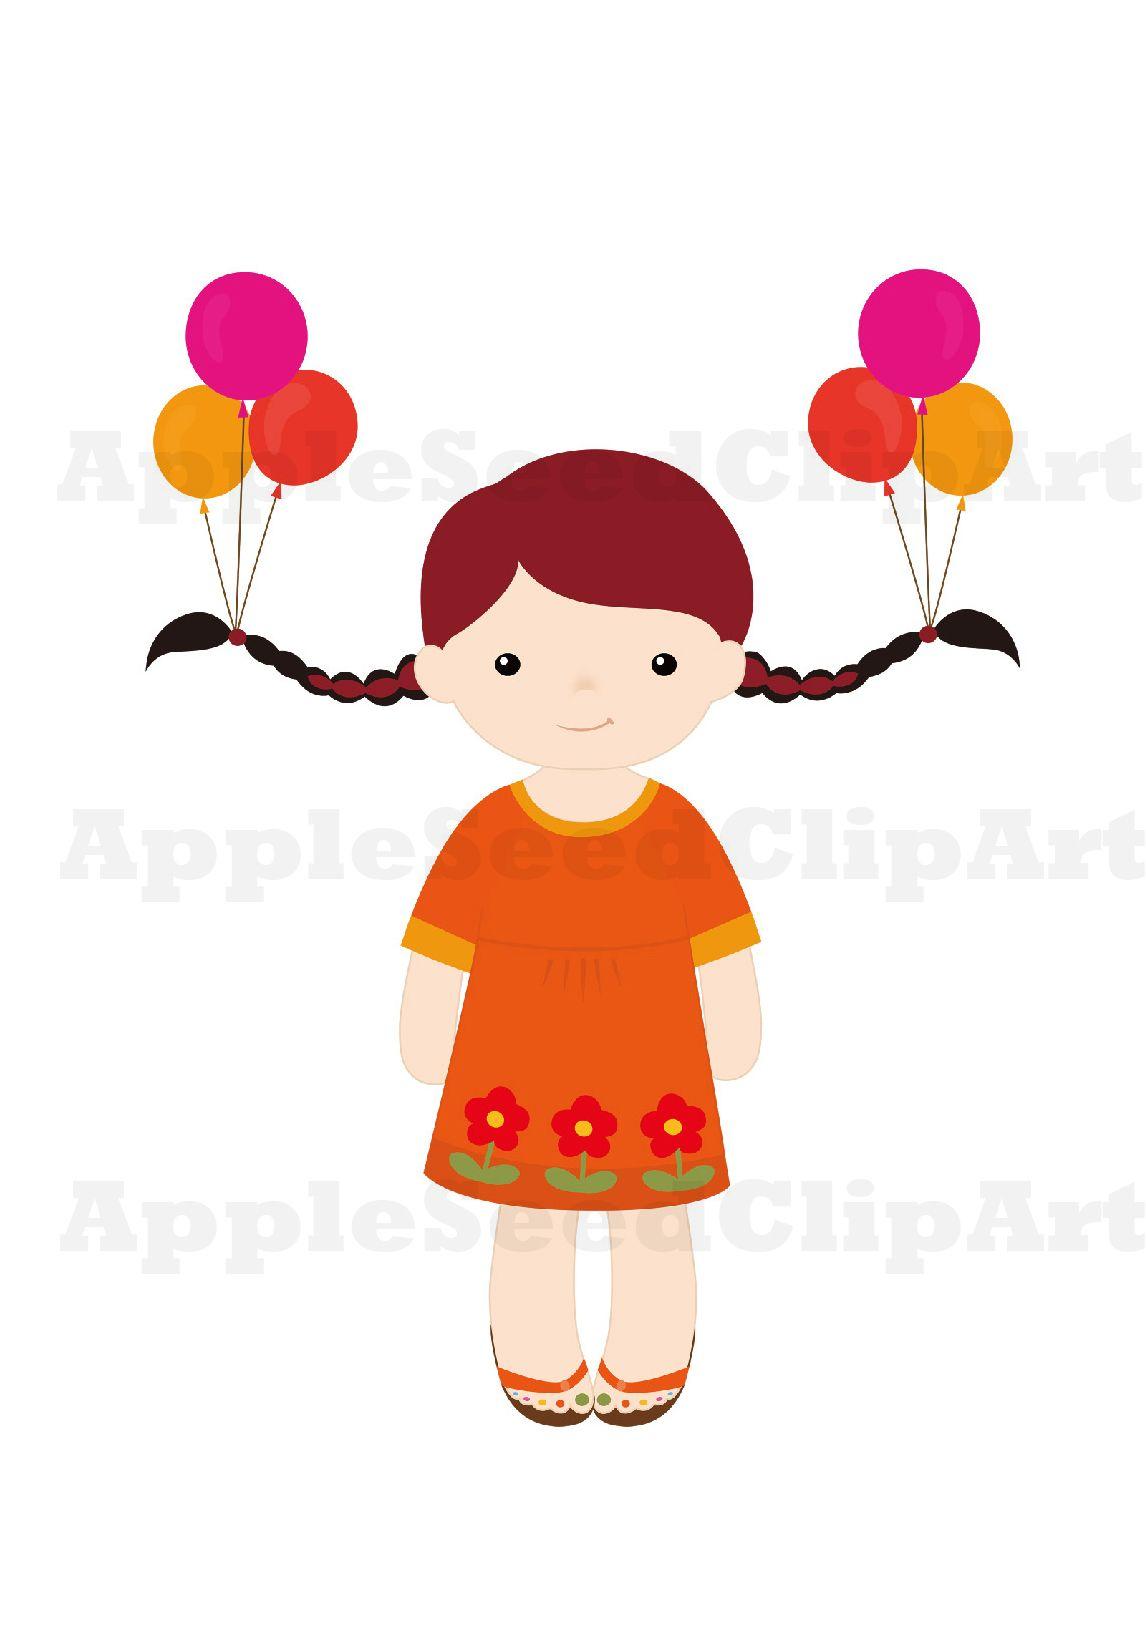 crazy hair day digital clip art pajamas day digital clip art mix rh pinterest com crazy hair day clipart crazy hair clipart free